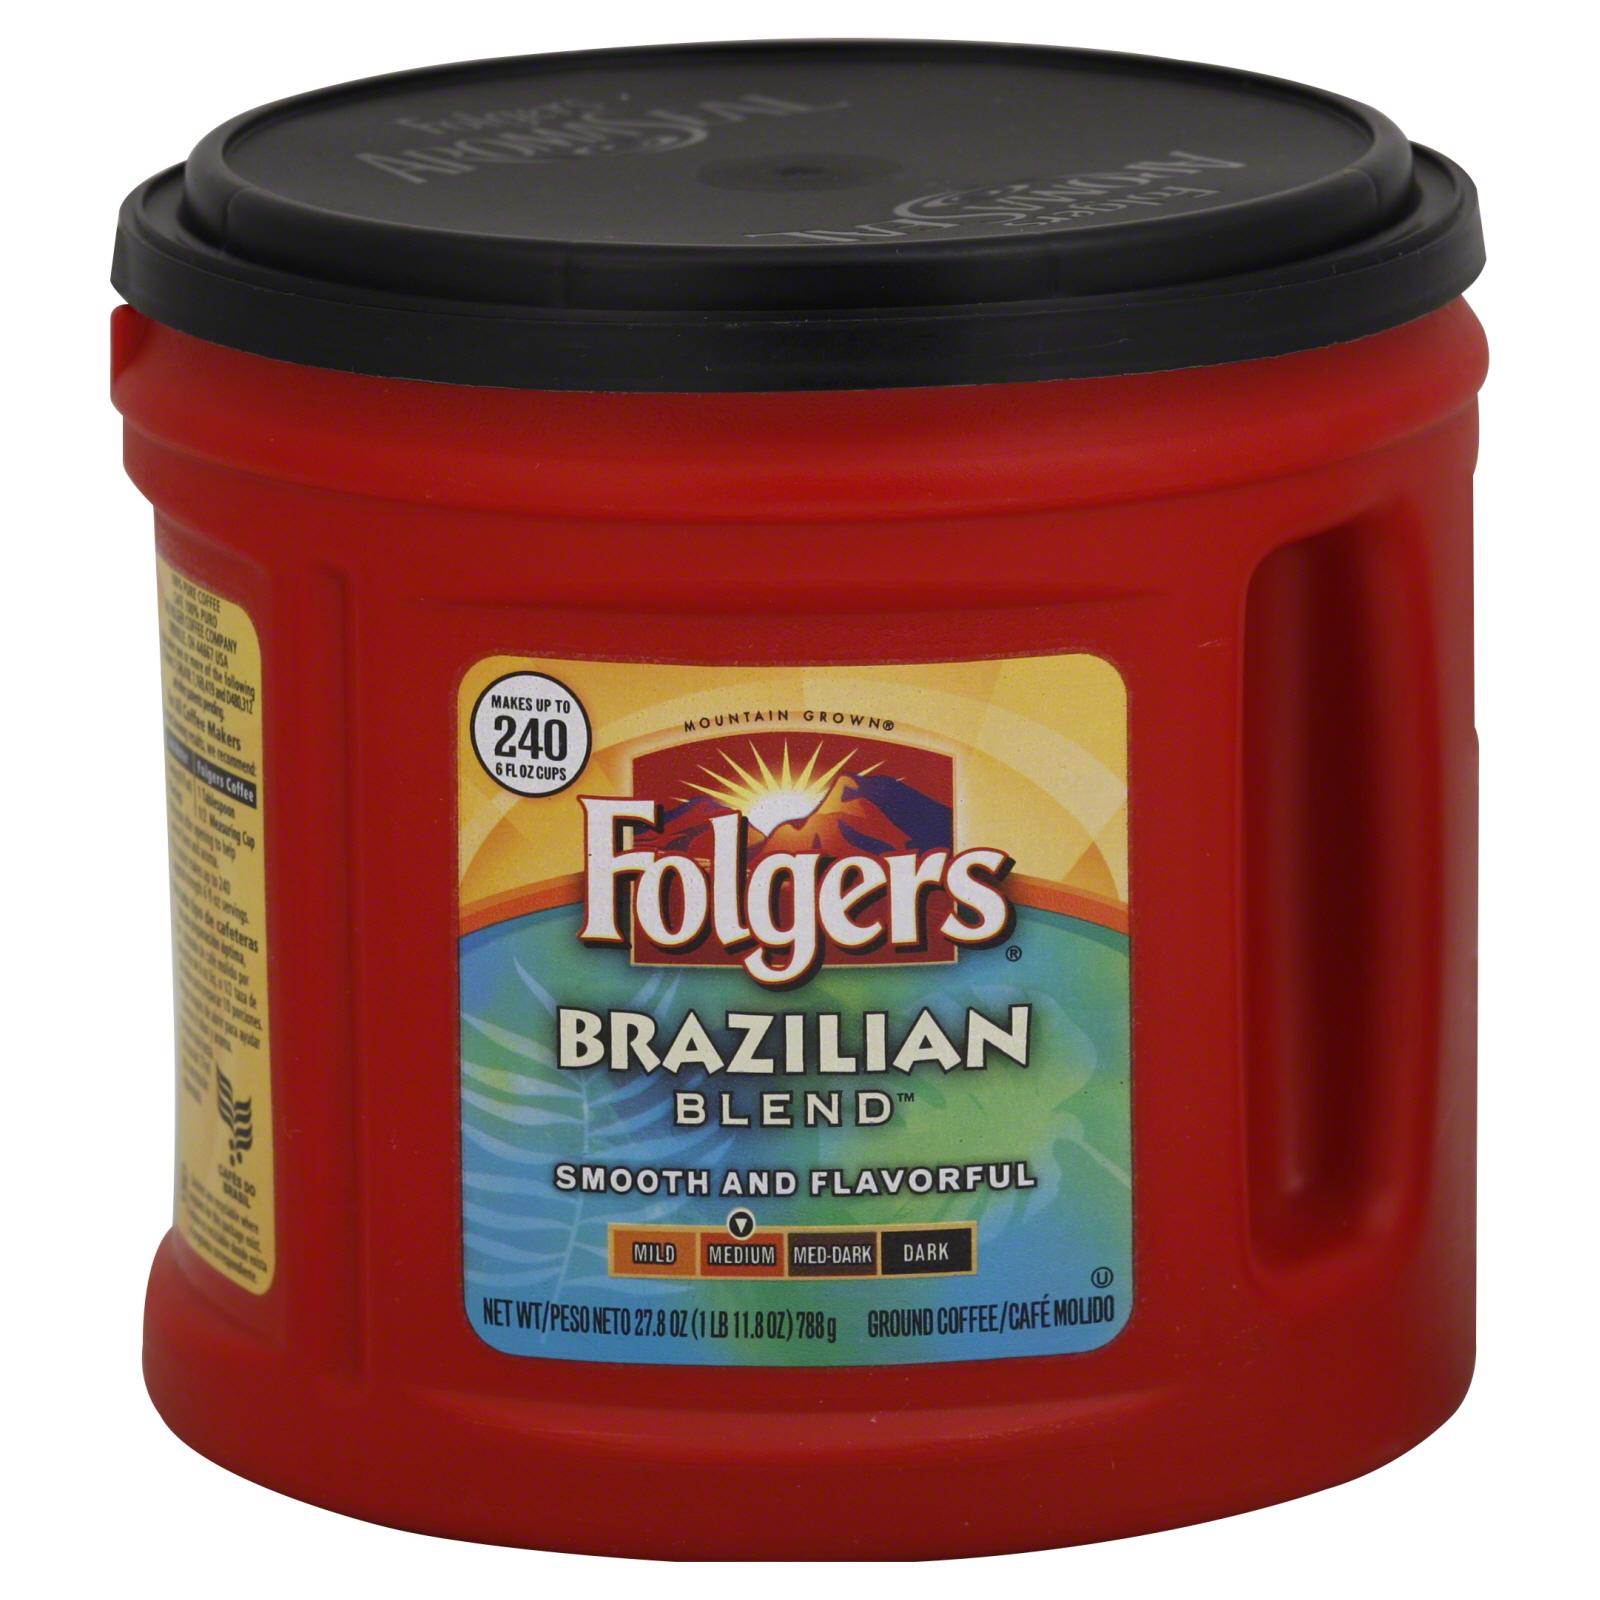 Folgers One Cup Coffee Maker : Folgers Coffee, Ground, Medium, Brazilian Blend, 27.8 oz (1 lb 11.8 oz) 788 g - Food & Grocery ...